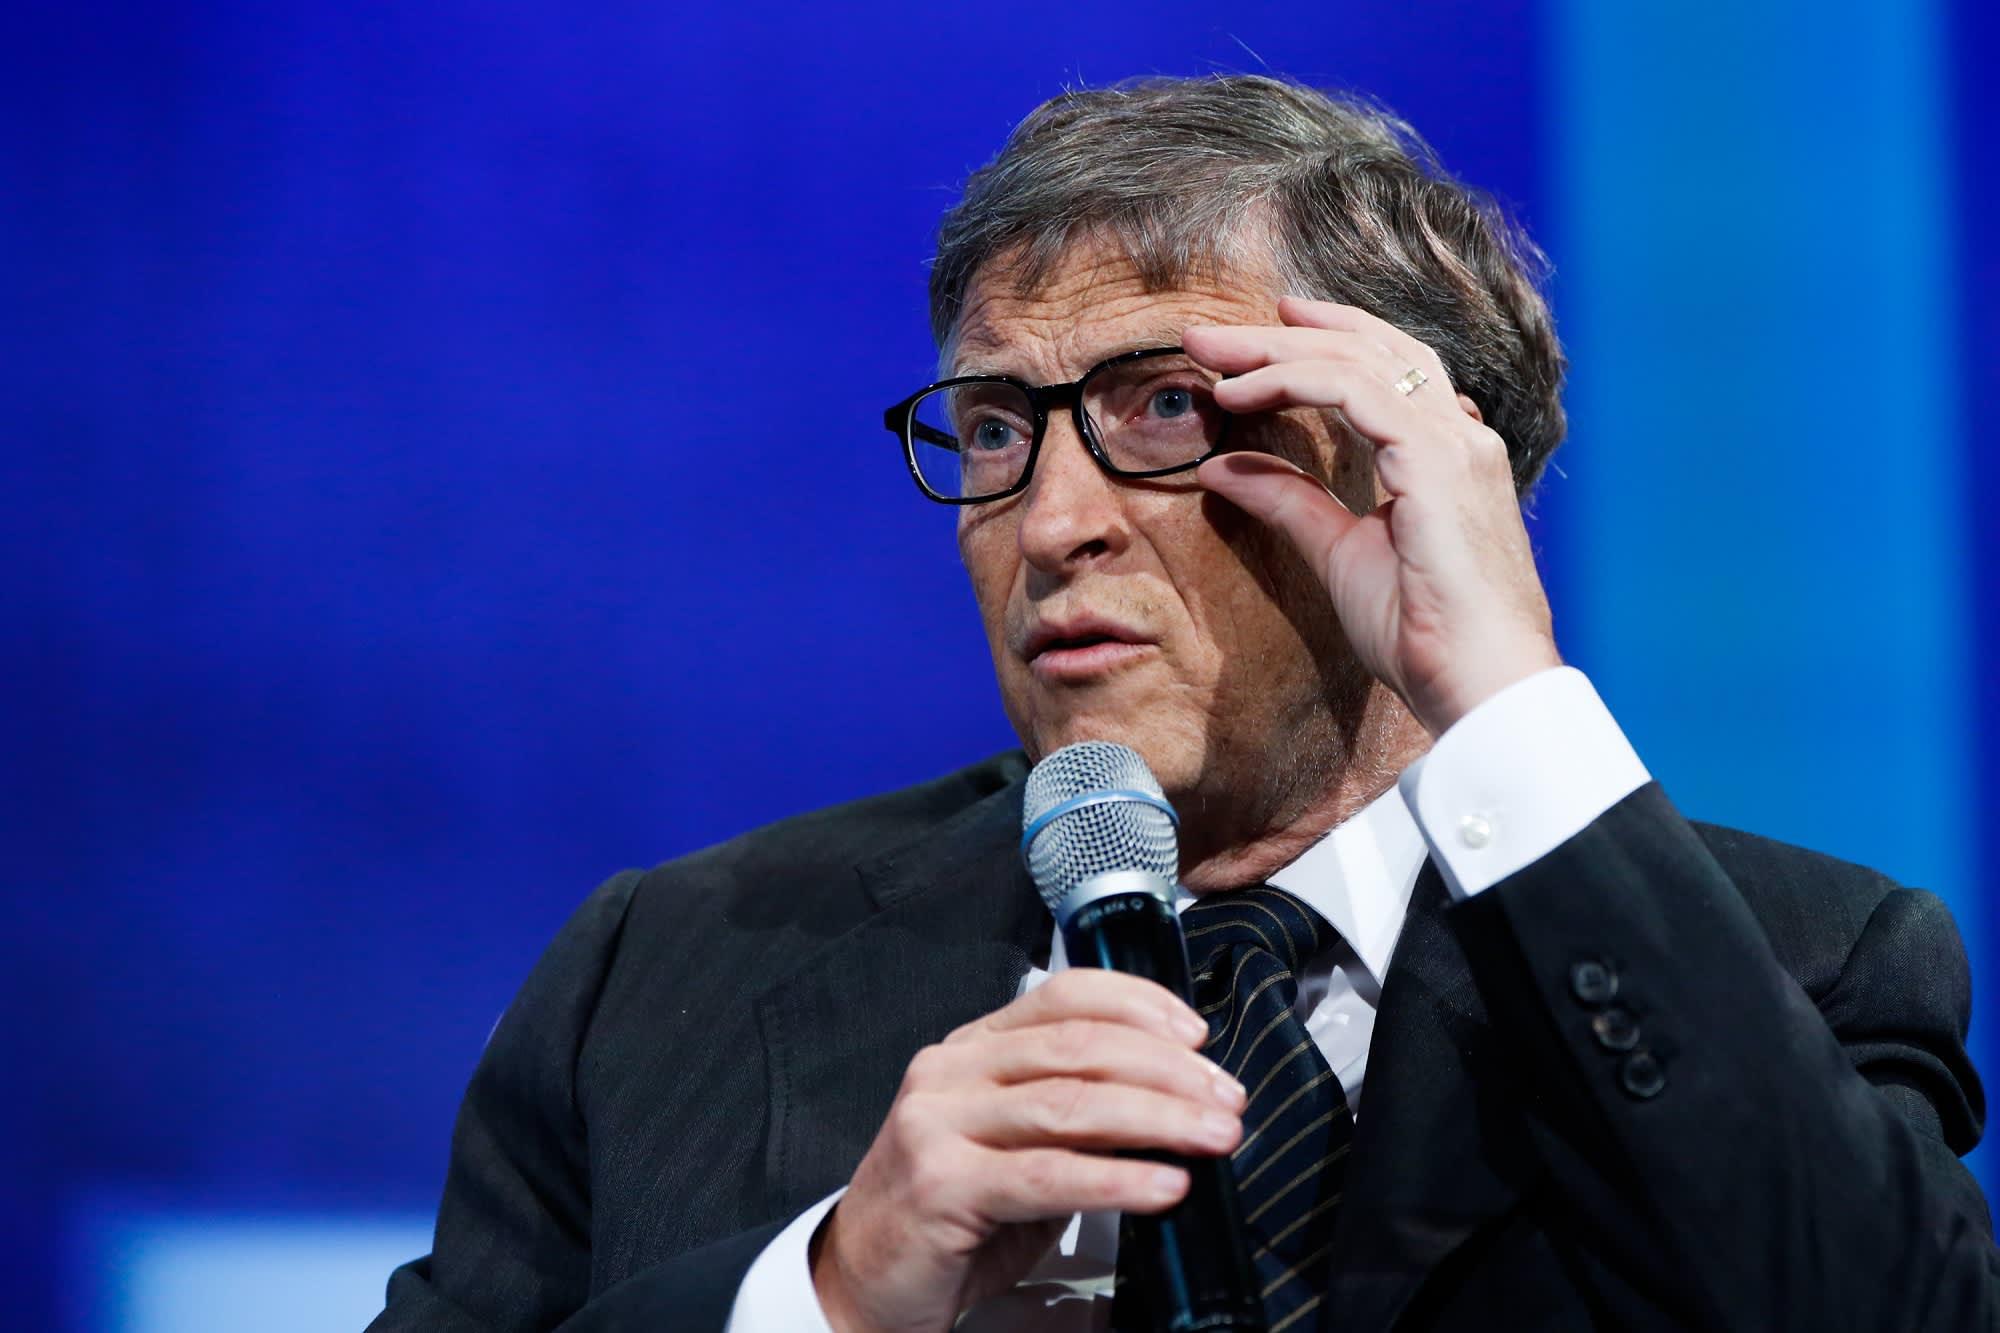 Bill Gates, Warren Buffett and Oprah all use the 5-hour rule